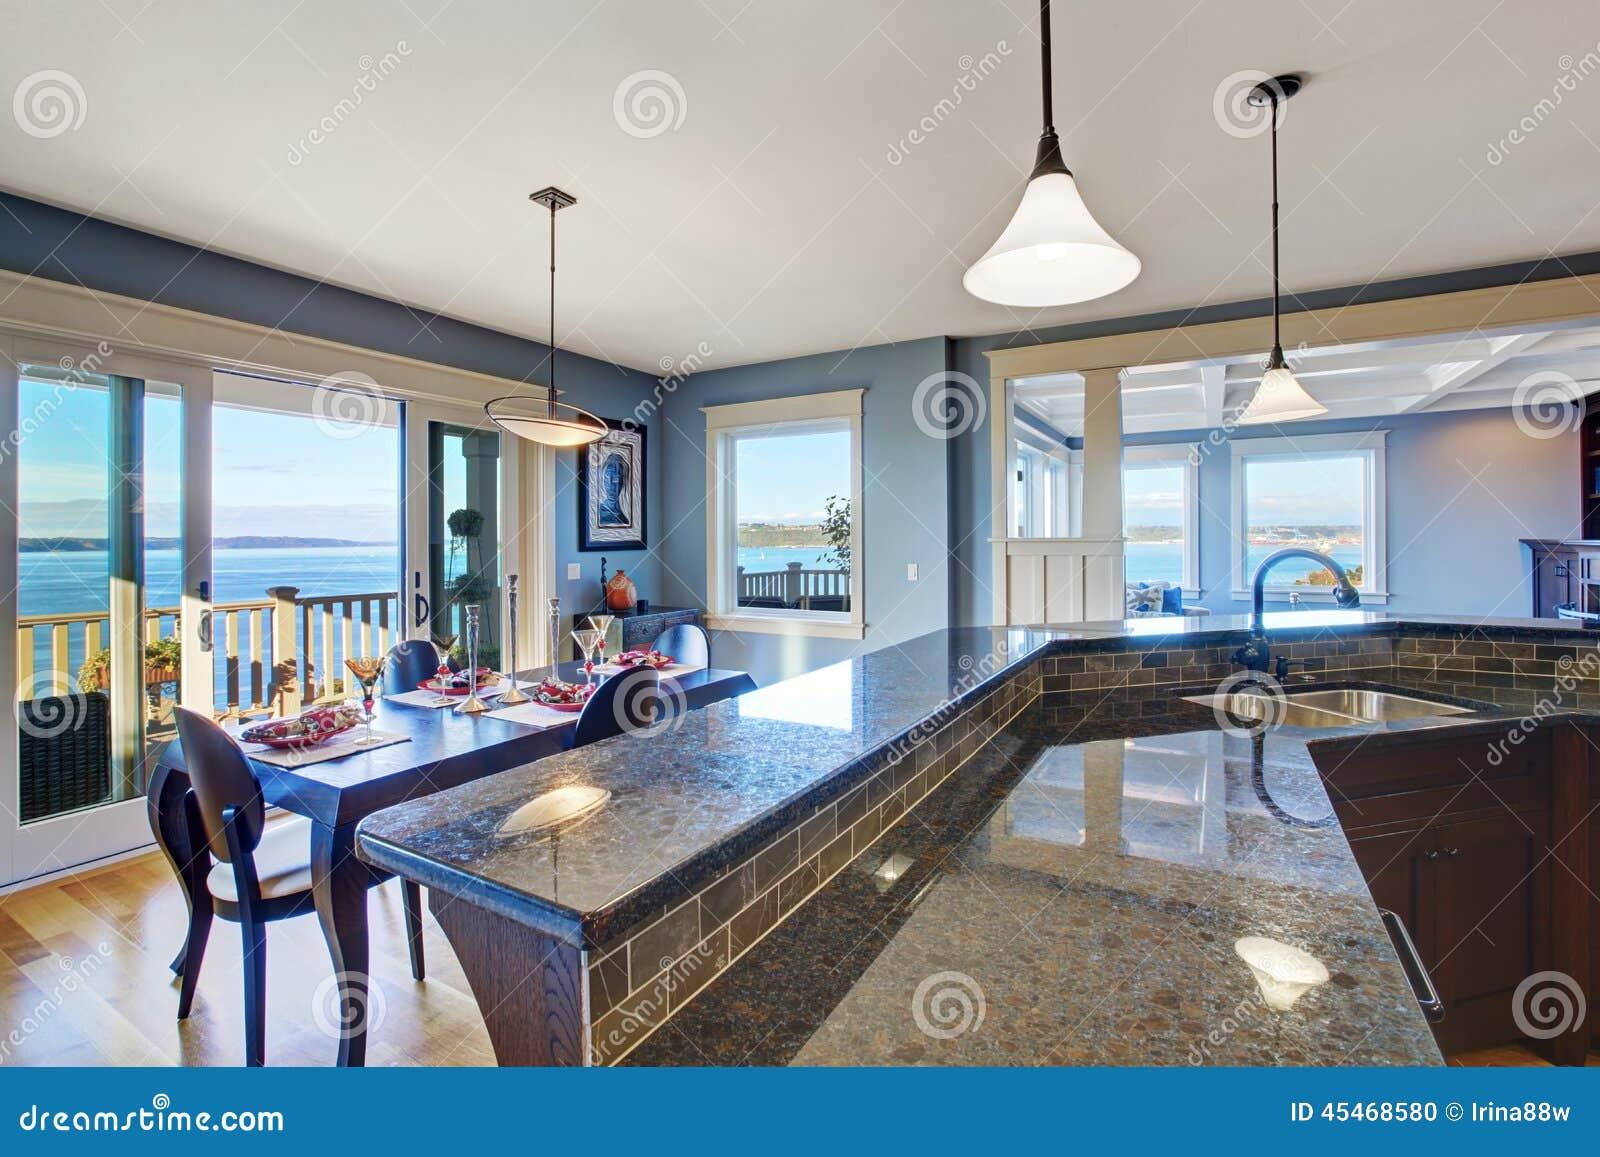 New Home Kitchen Interior Dark Brown Cabinets Stock Photos - 64 Images